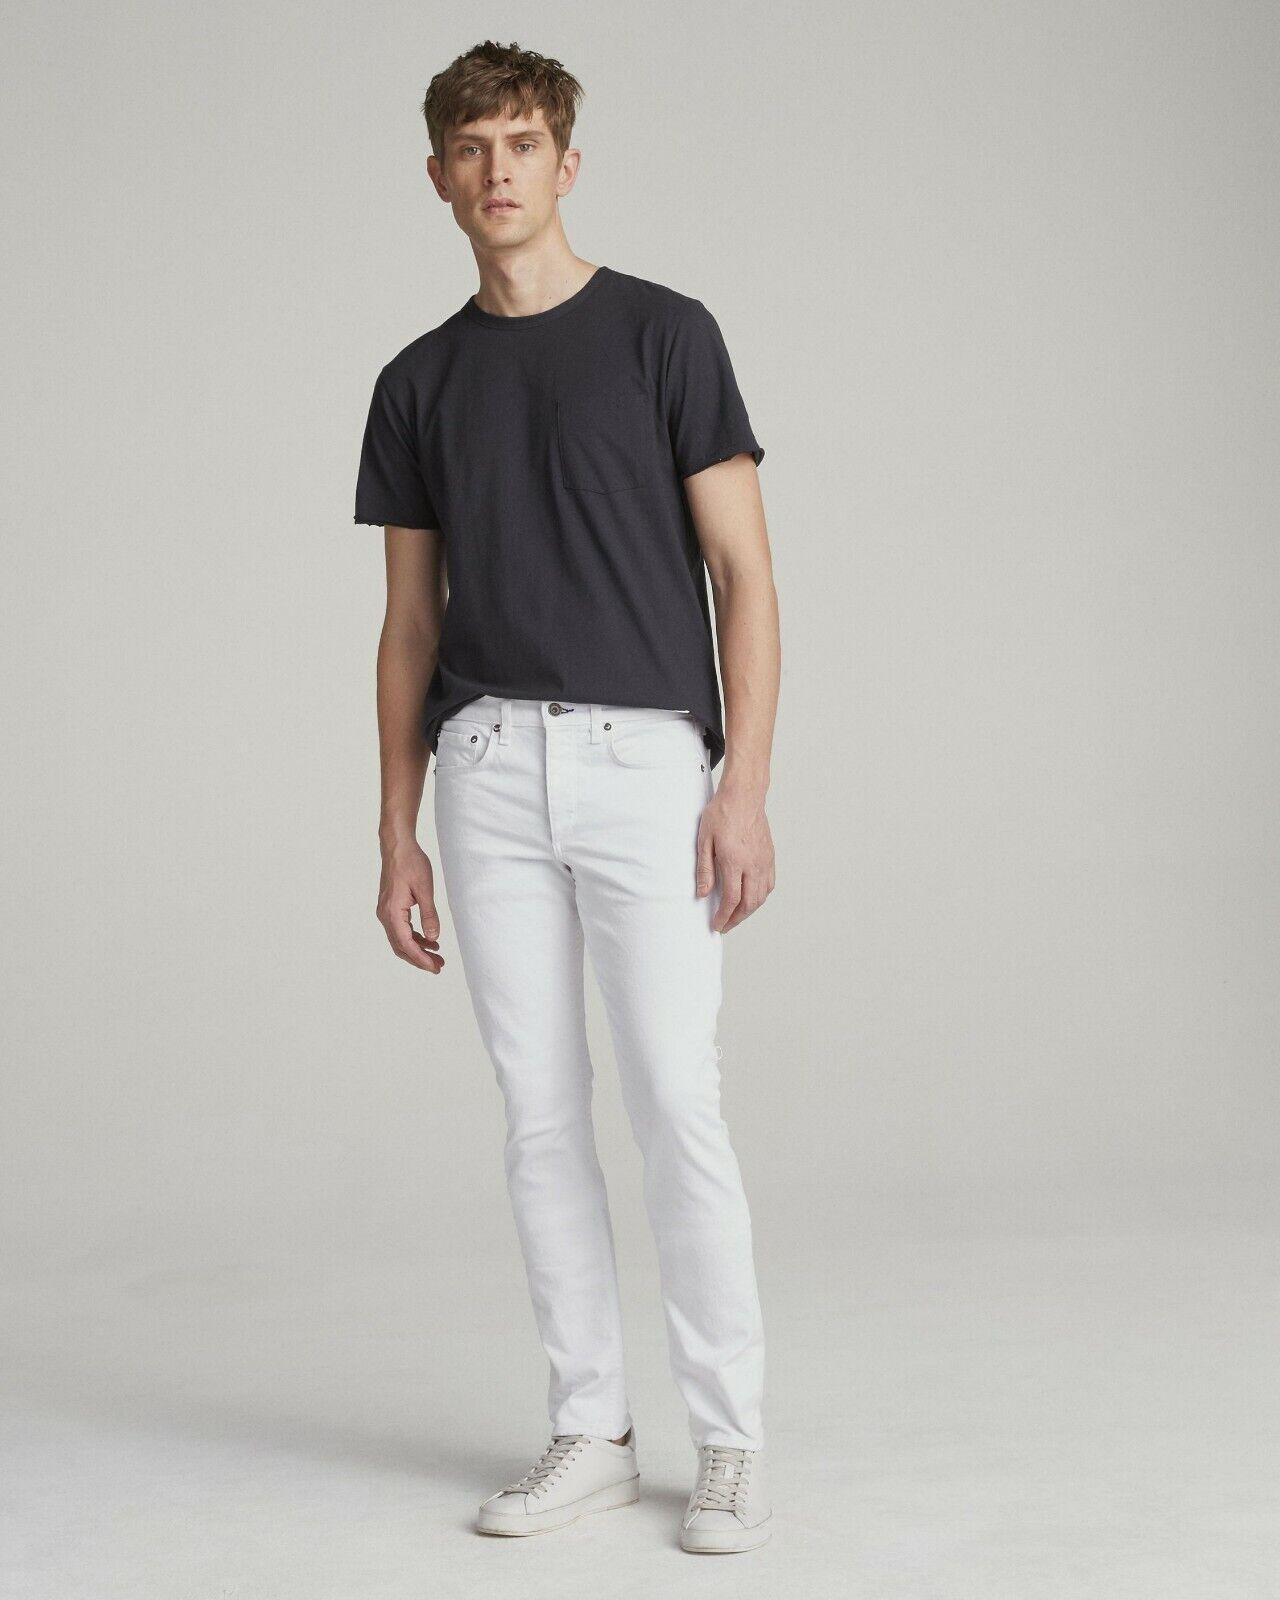 Men's rag & bone Fit 1 Extra Slim Fit Jeans White Sz 34 x 33 NWT M1224O137WHT